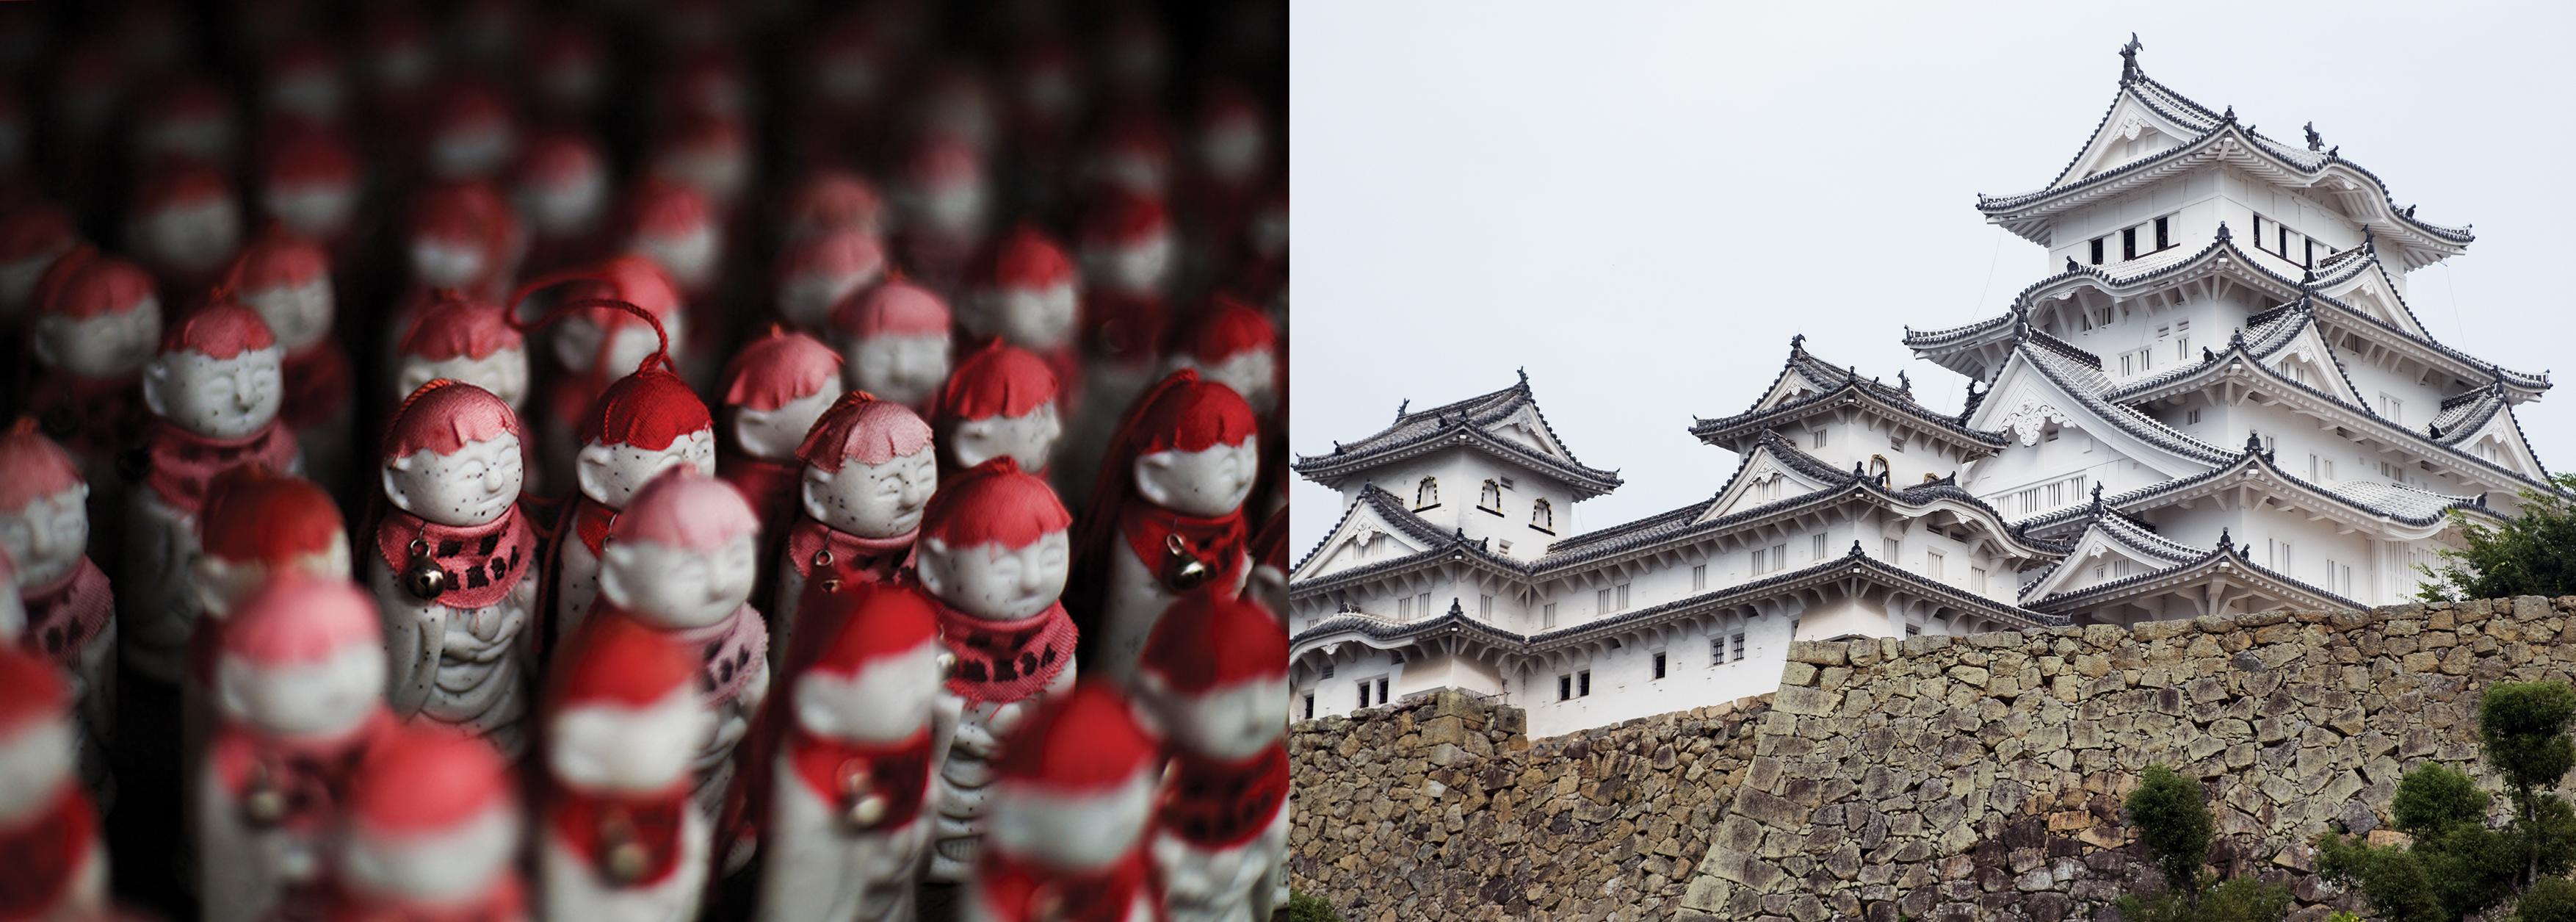 JapanBlogImage2